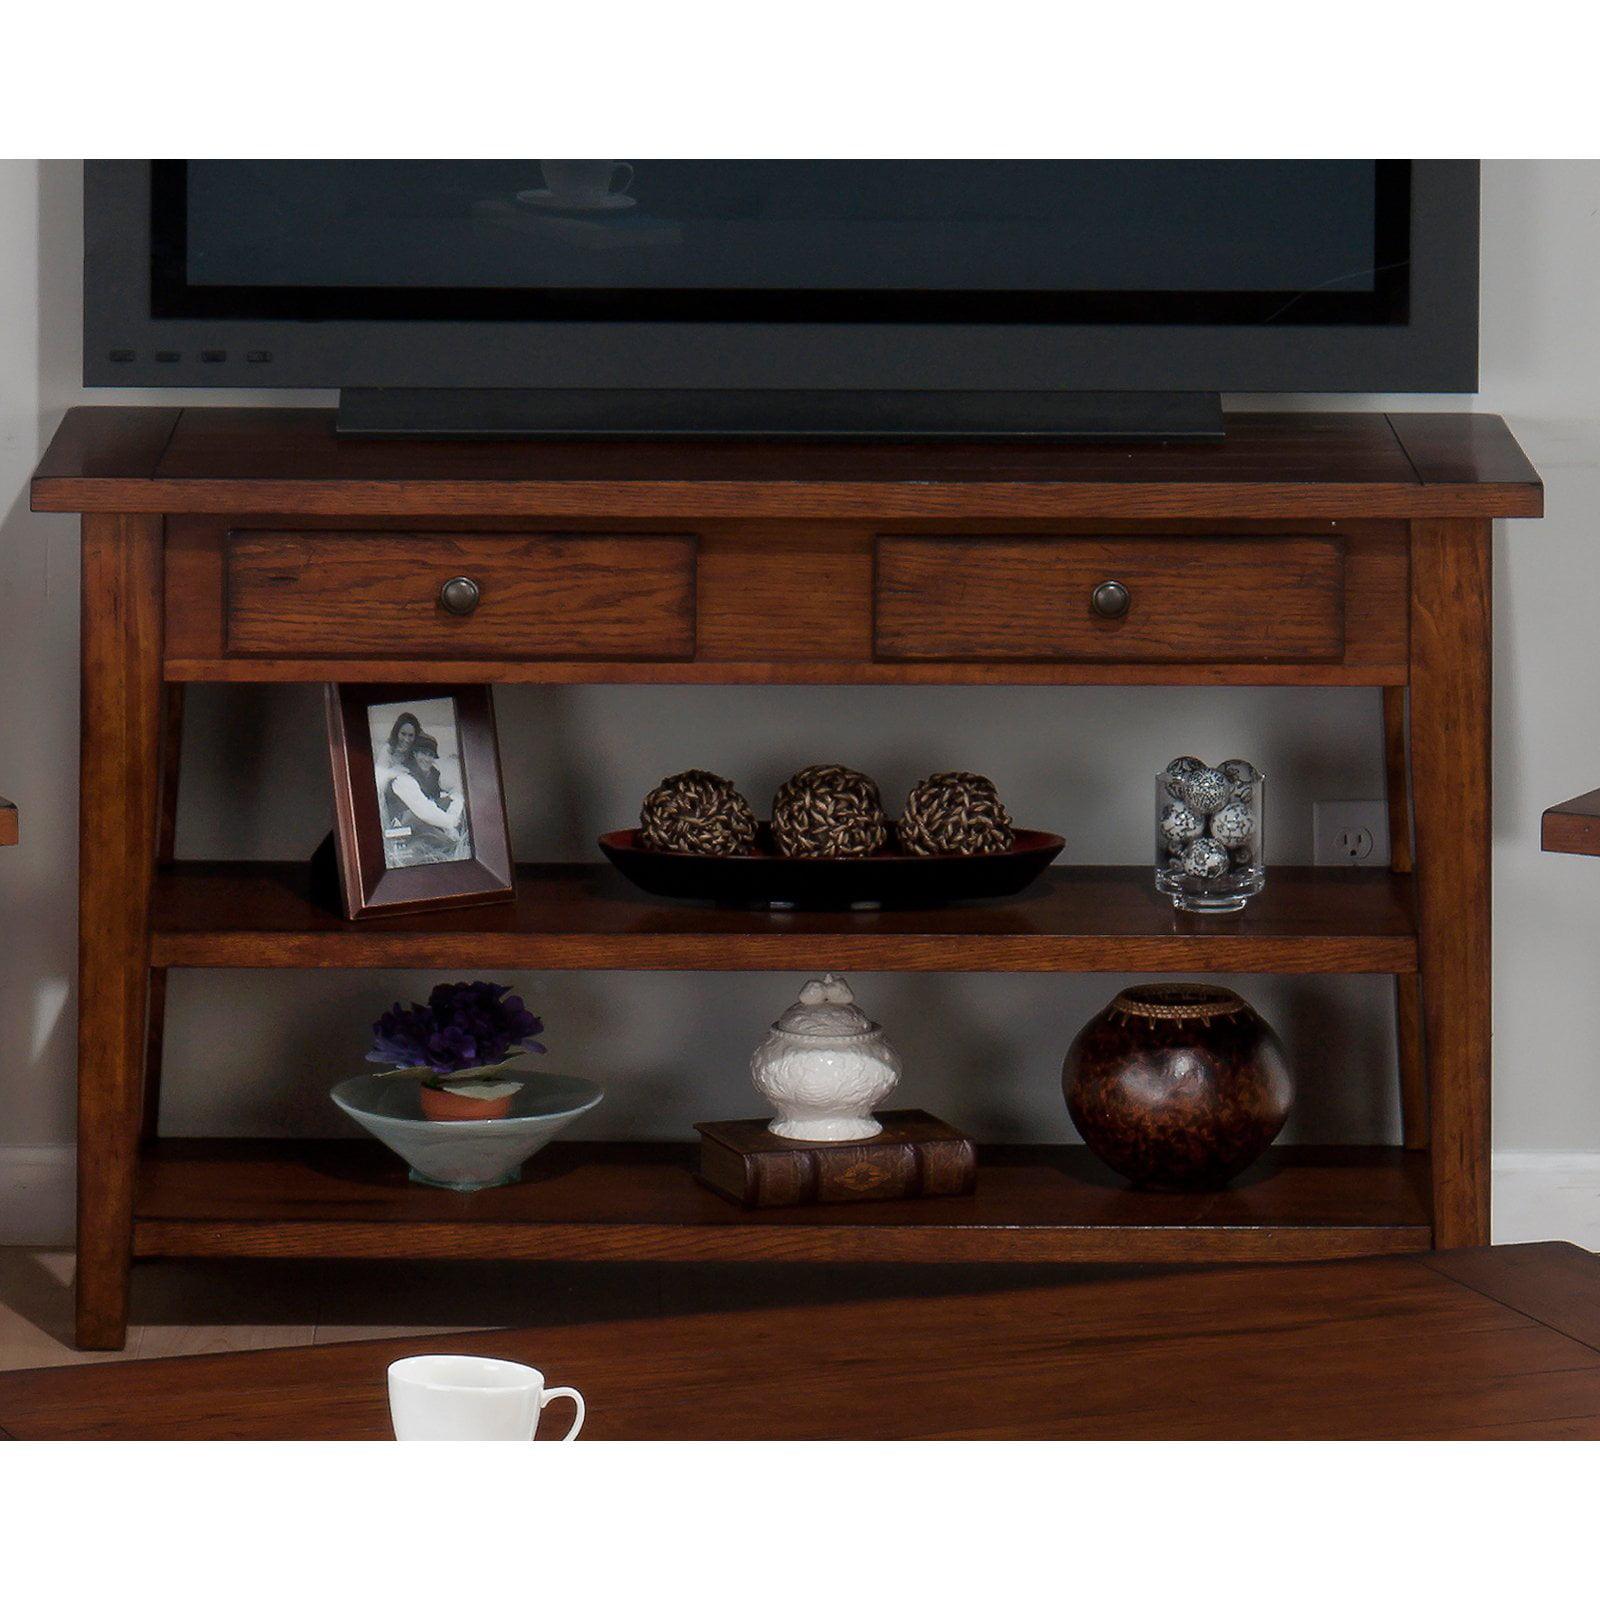 Jofran Clay County Sofa/Media Table - Medium Oak